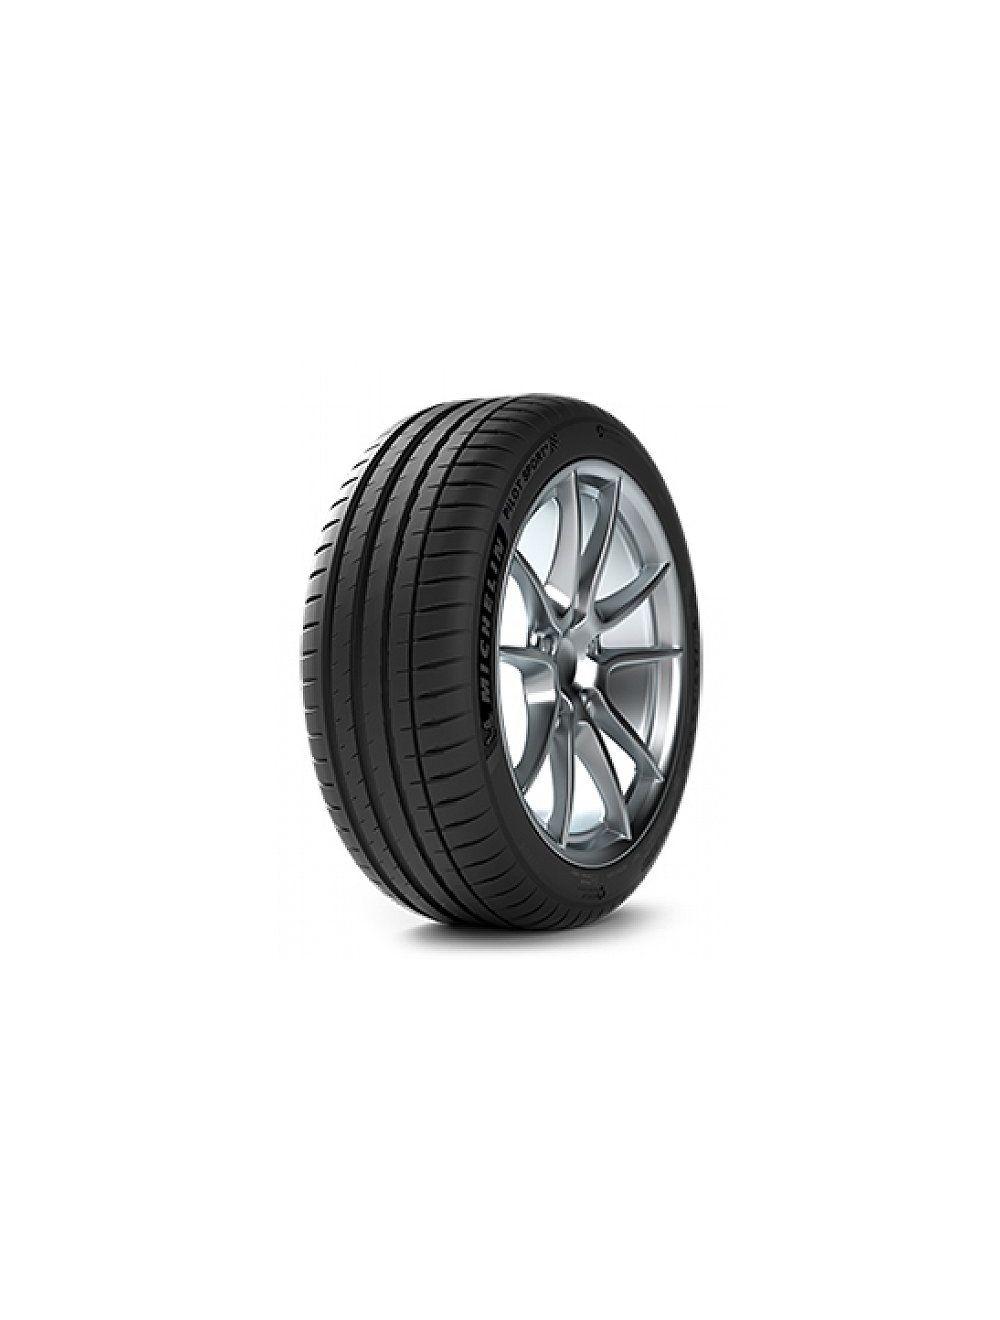 Michelin 245/40R18 Y Pilot Sport 4 XL Nyári gumi